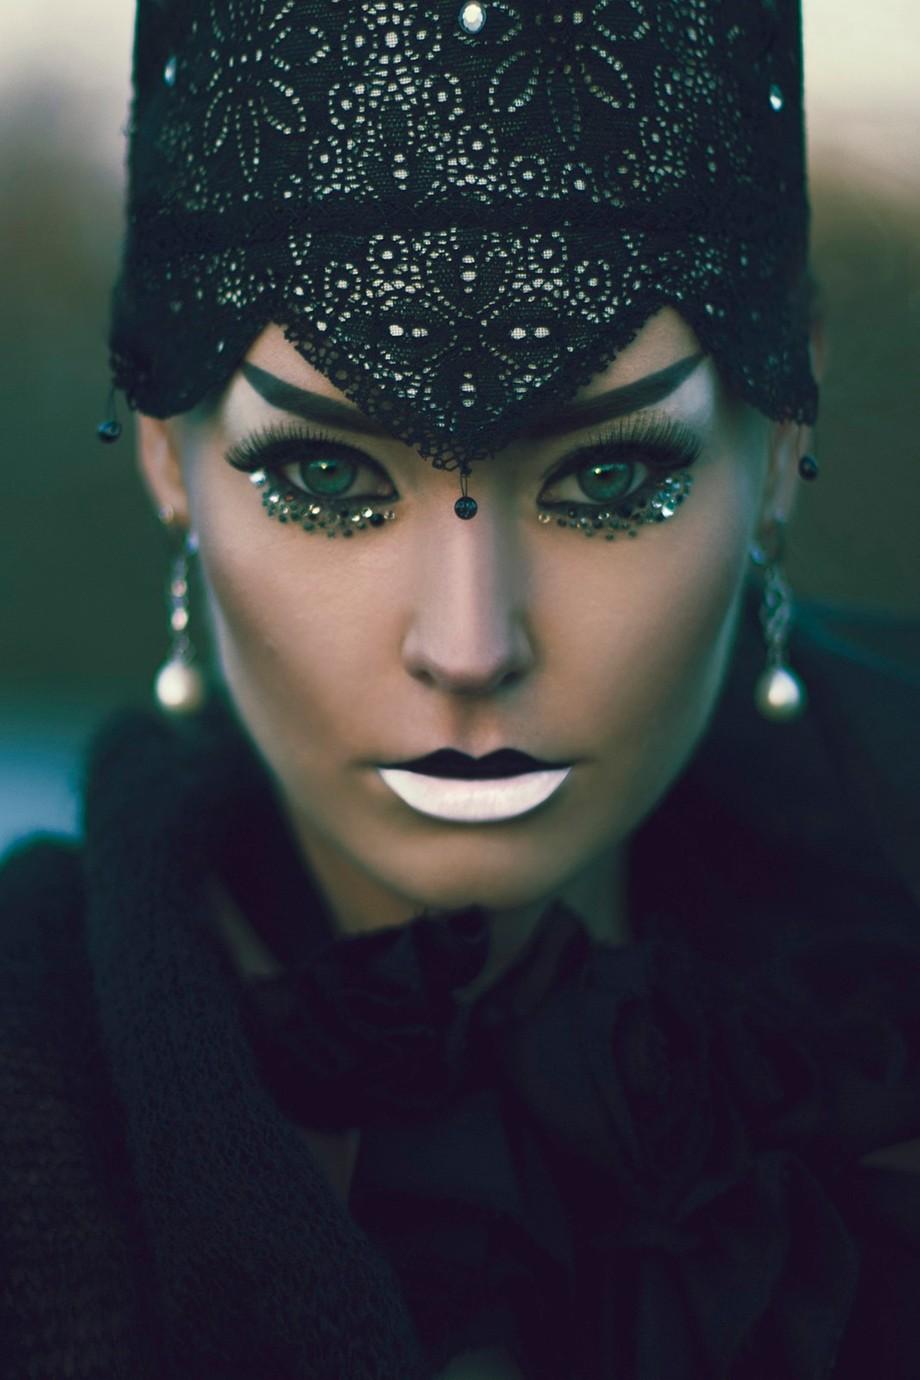 Killer Queen by marinastudio - Paint And Makeup Photo Contest